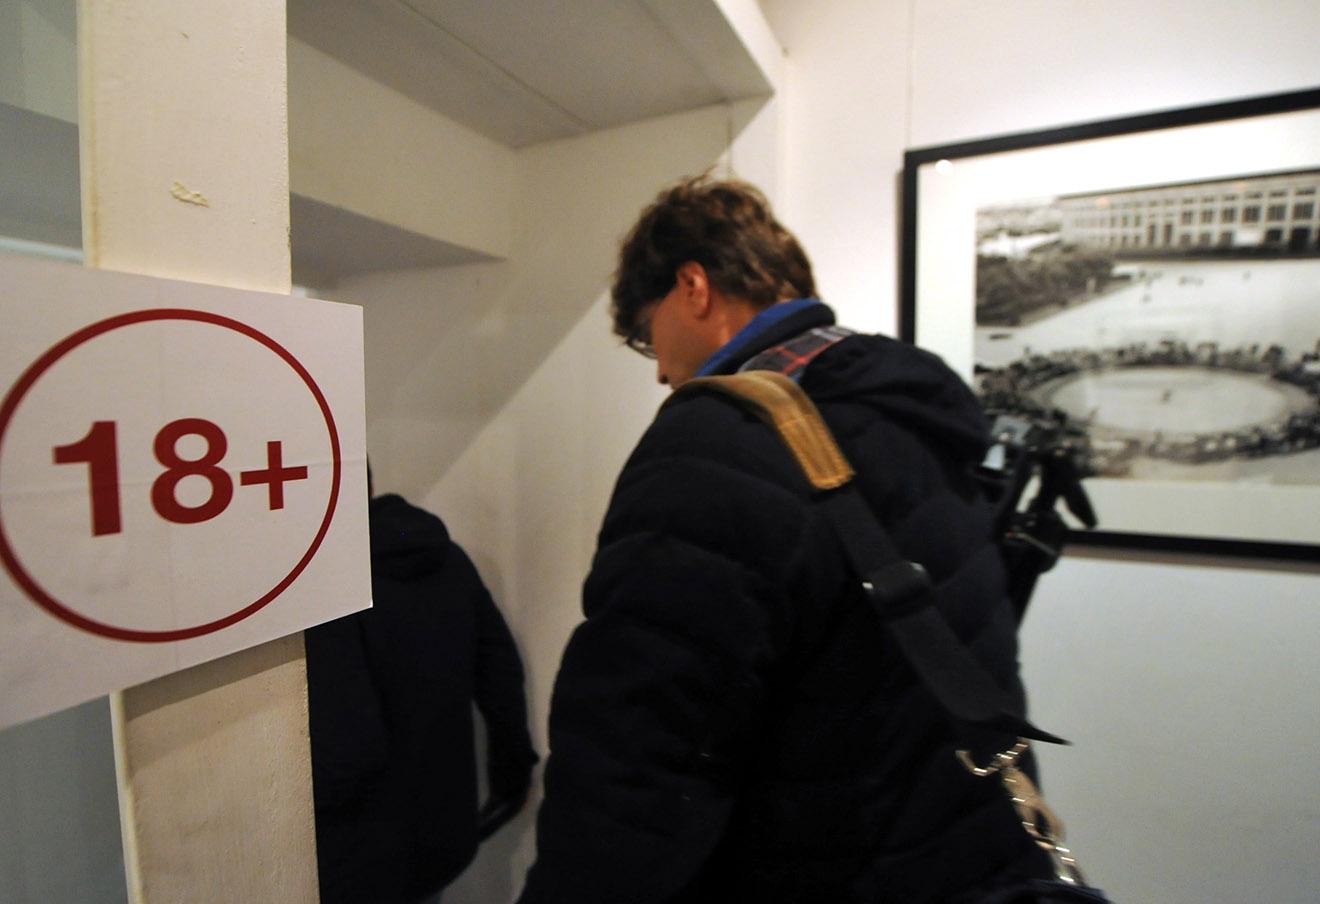 Фото: Андрей Махонин / ТАСС